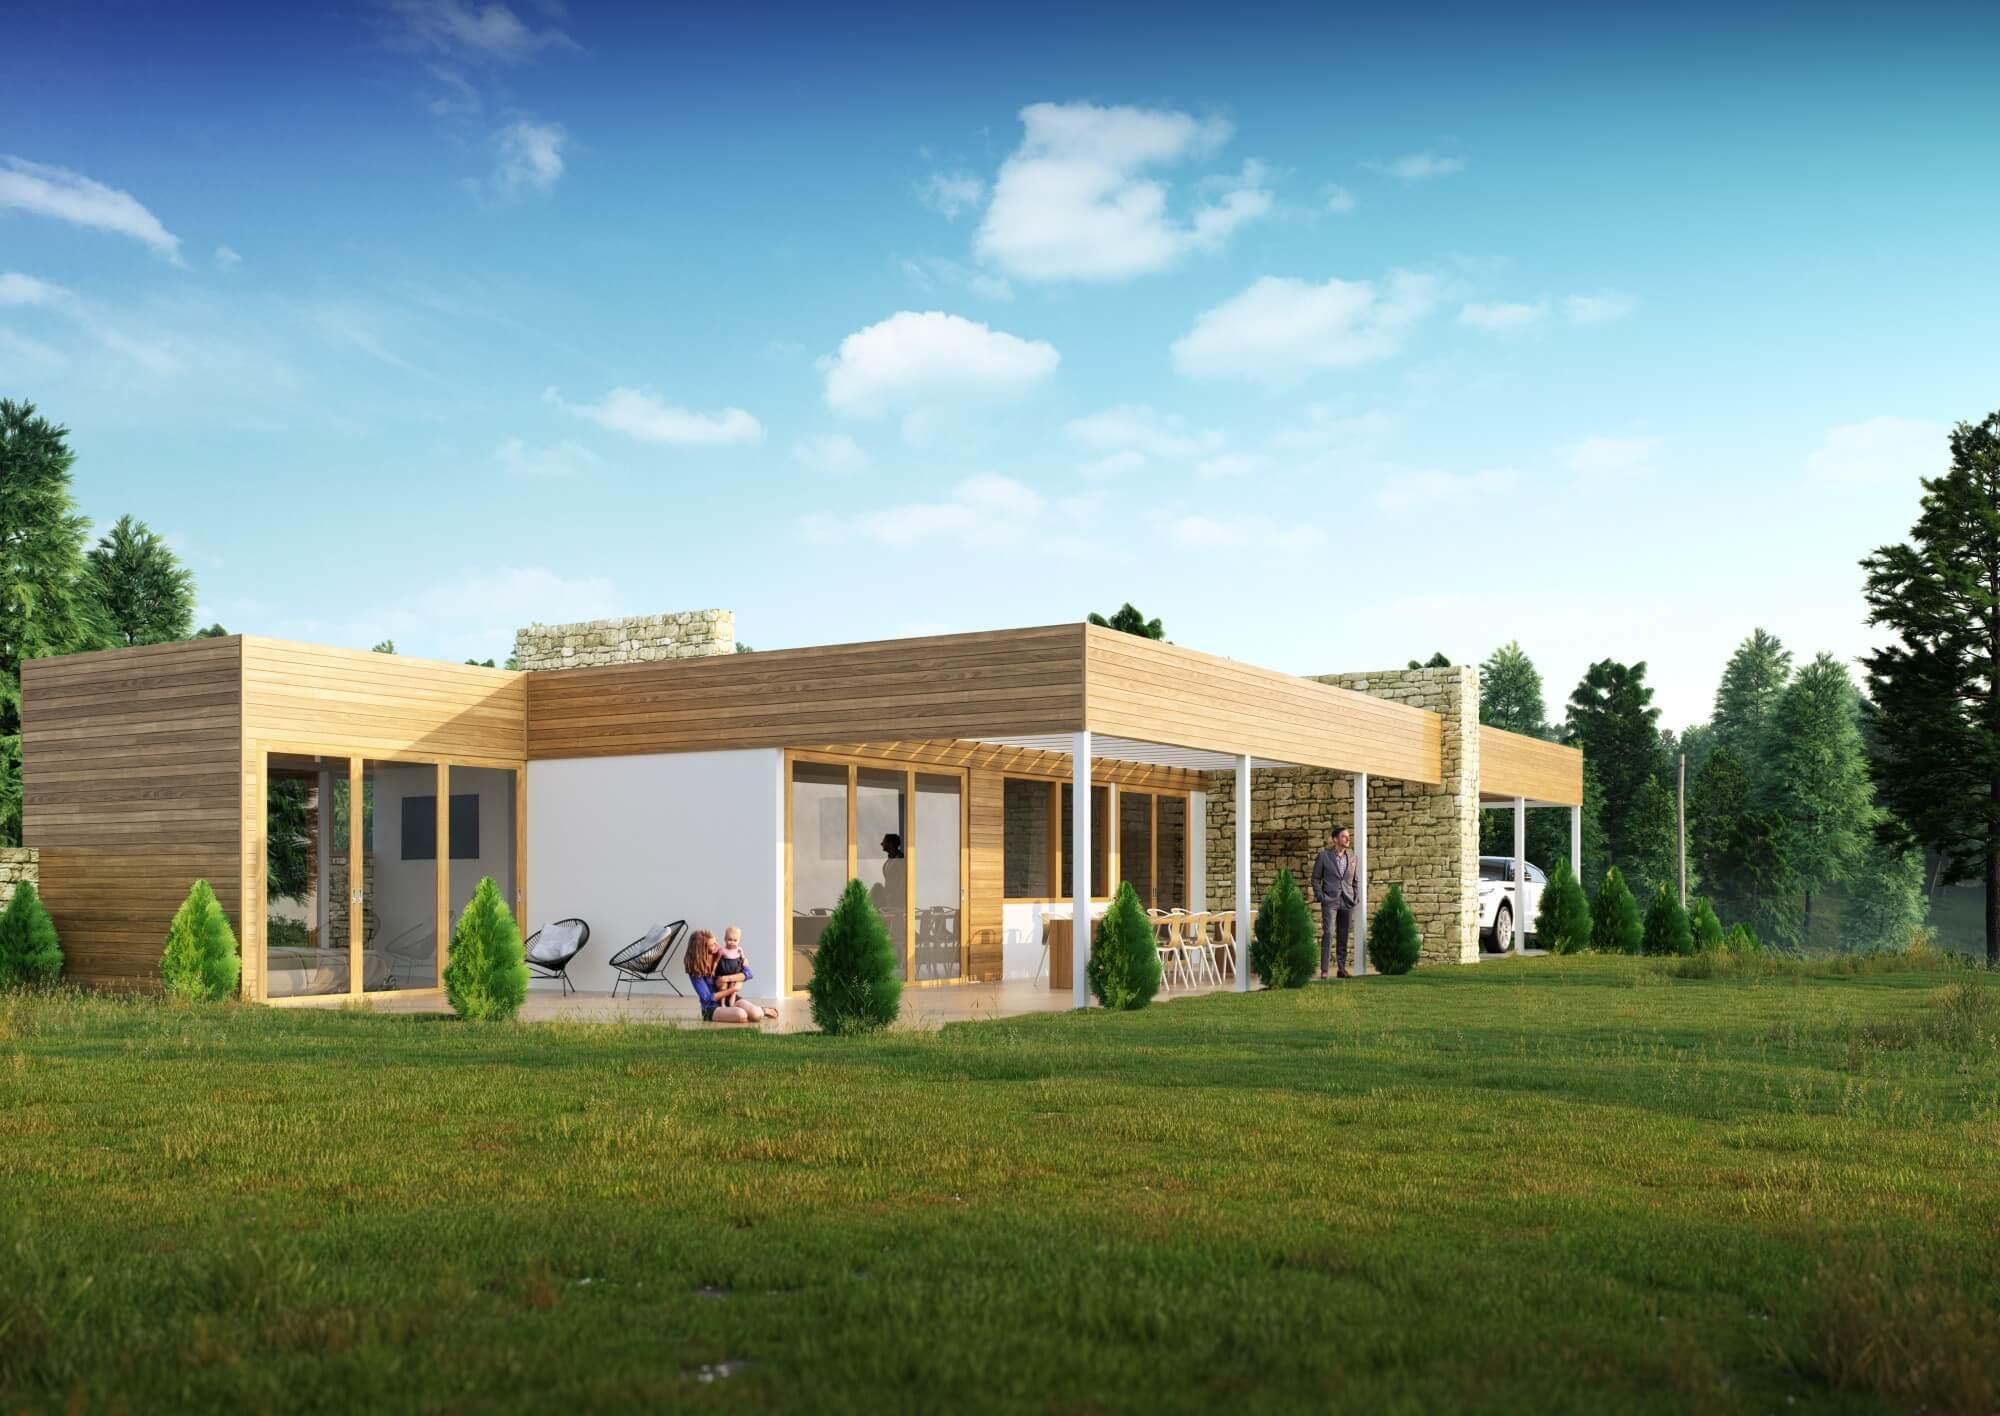 OPTi Housing Systems